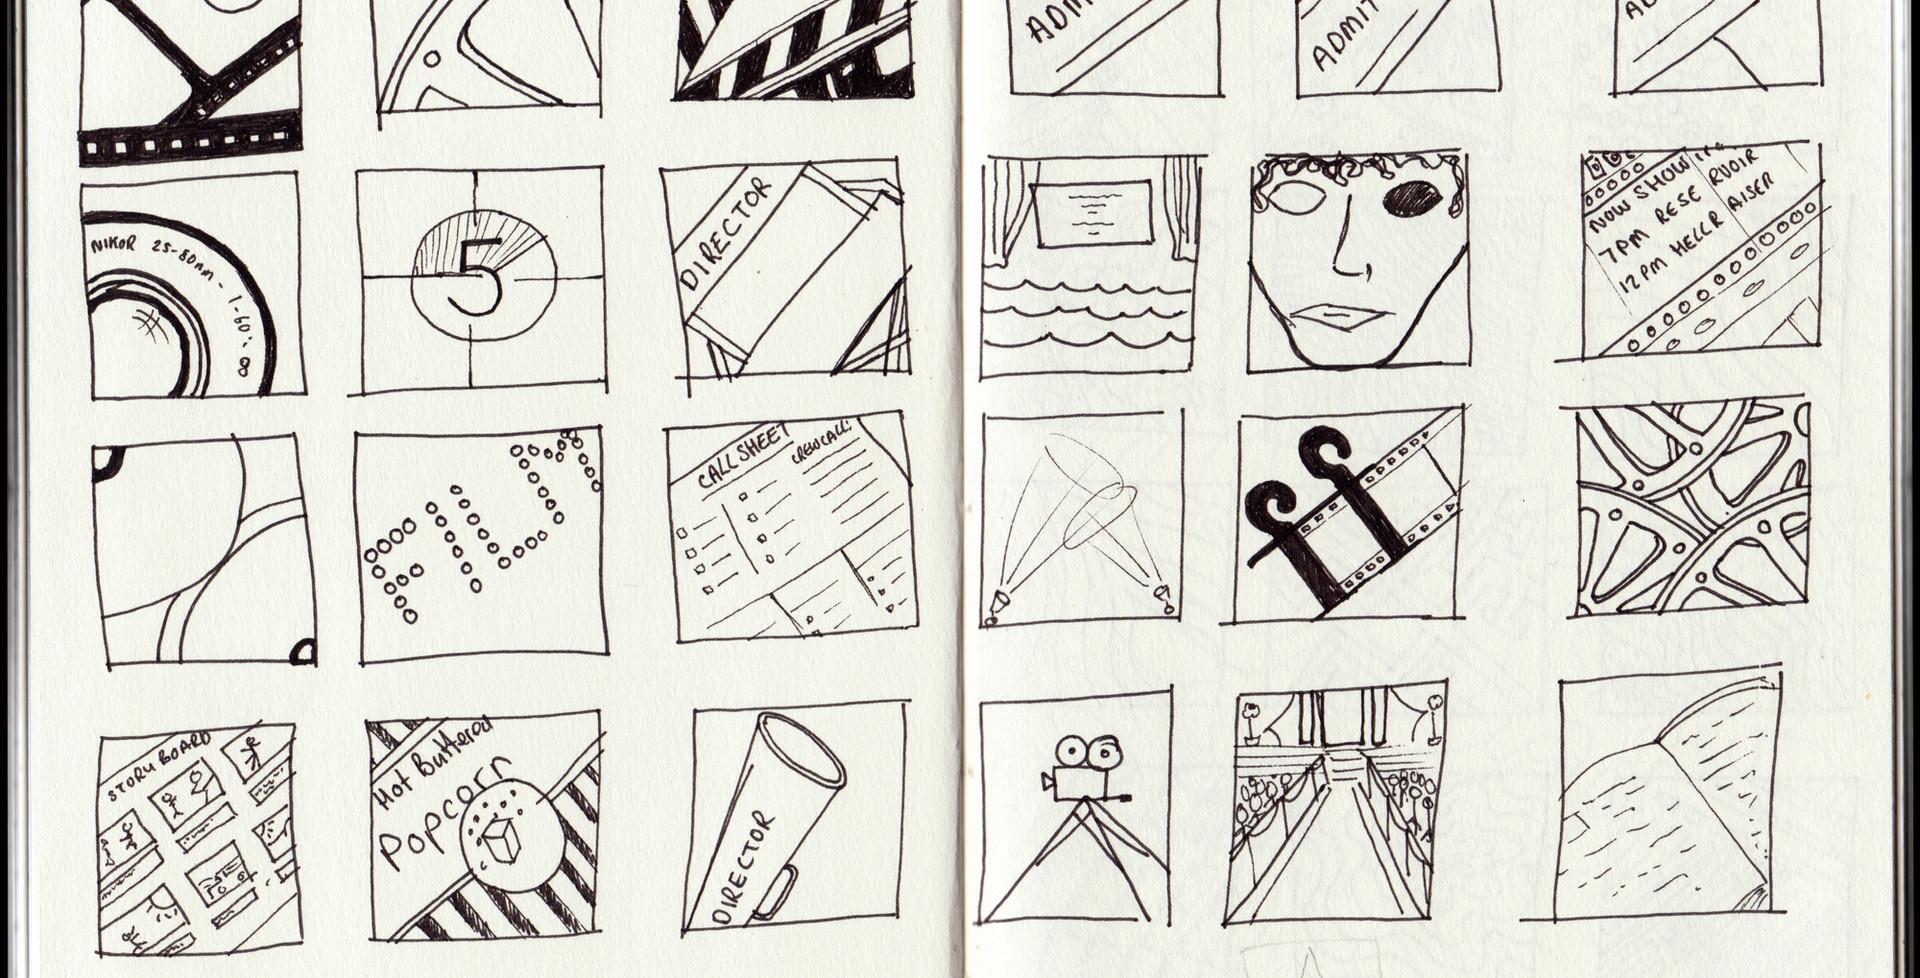 Sketchbook Page 11